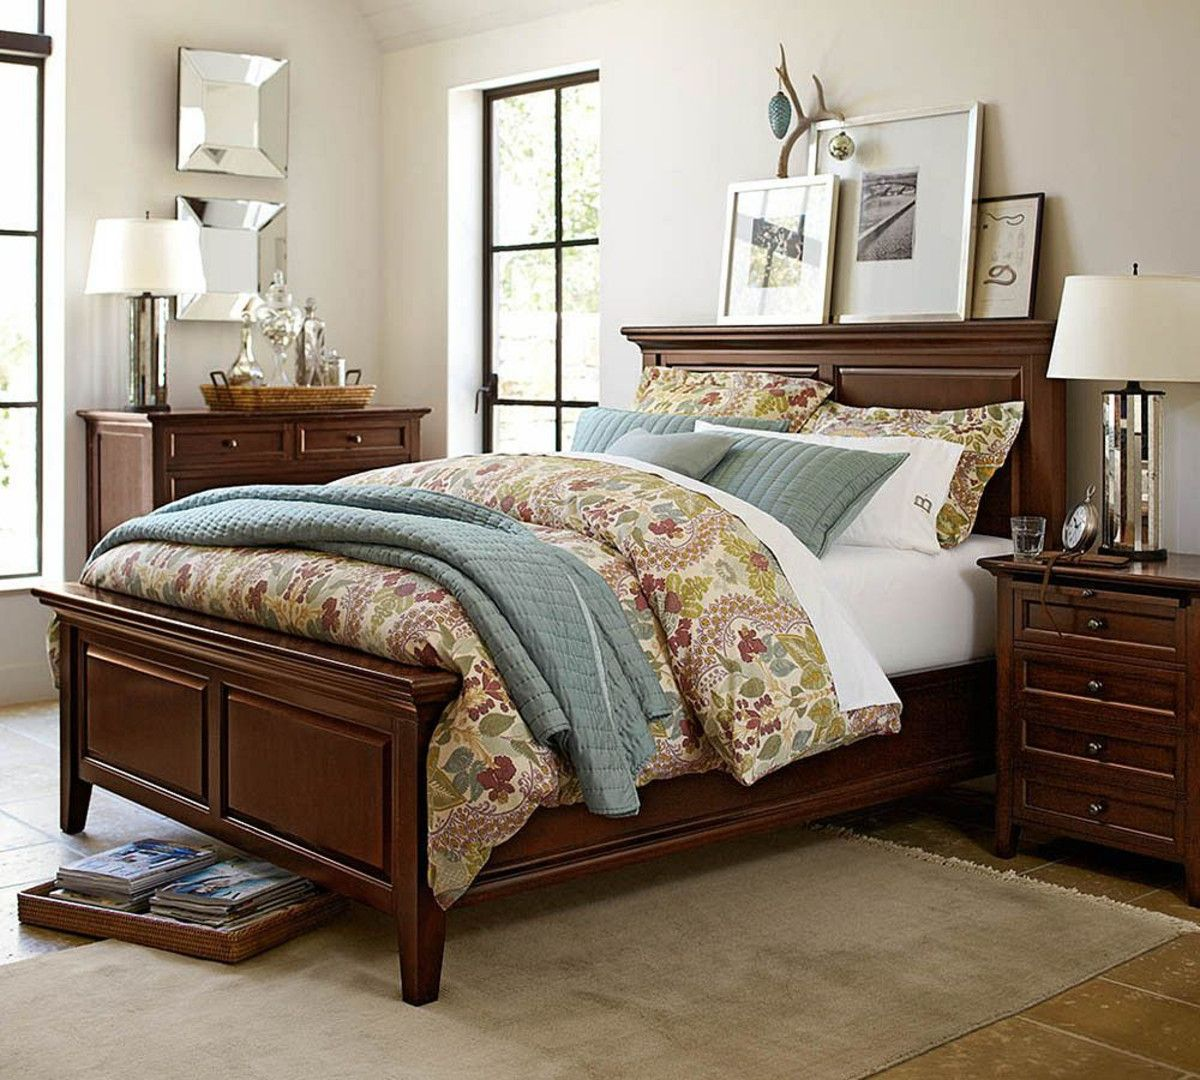 bedroom furniture pottery barn rh ihoused nvrdns com